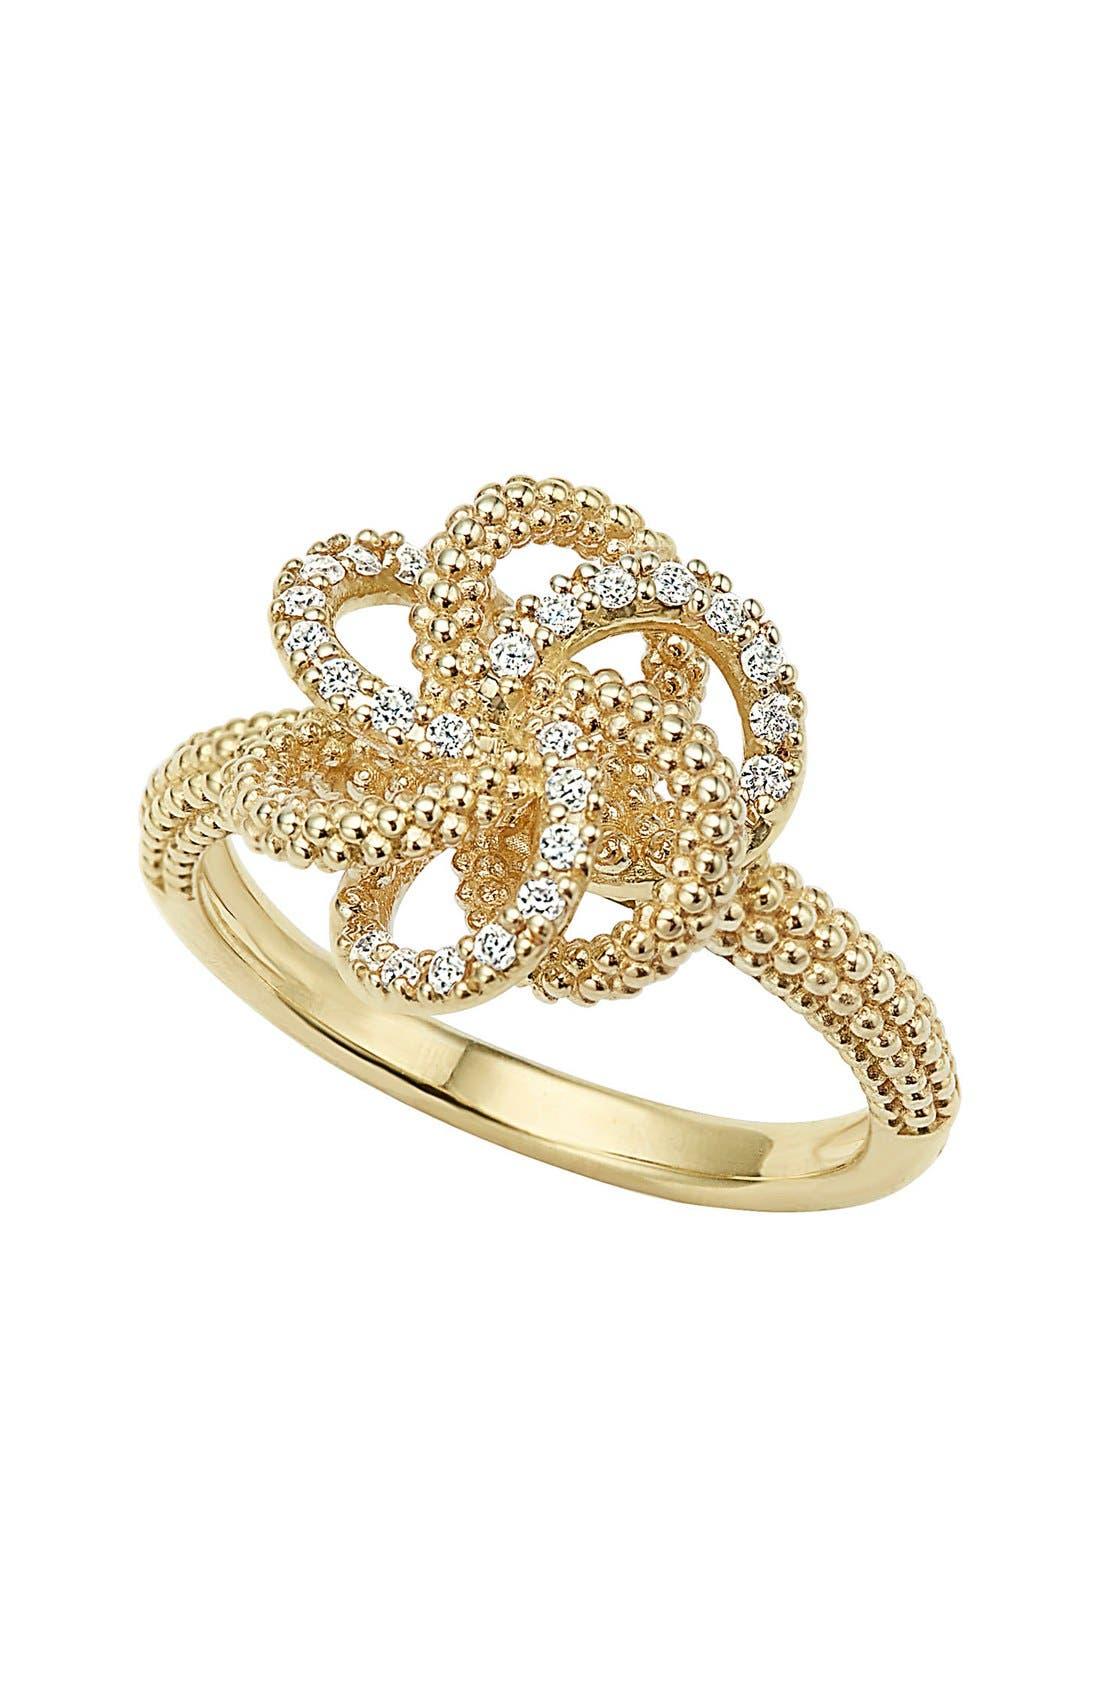 LAGOS 'Love Knot' Diamond Ring